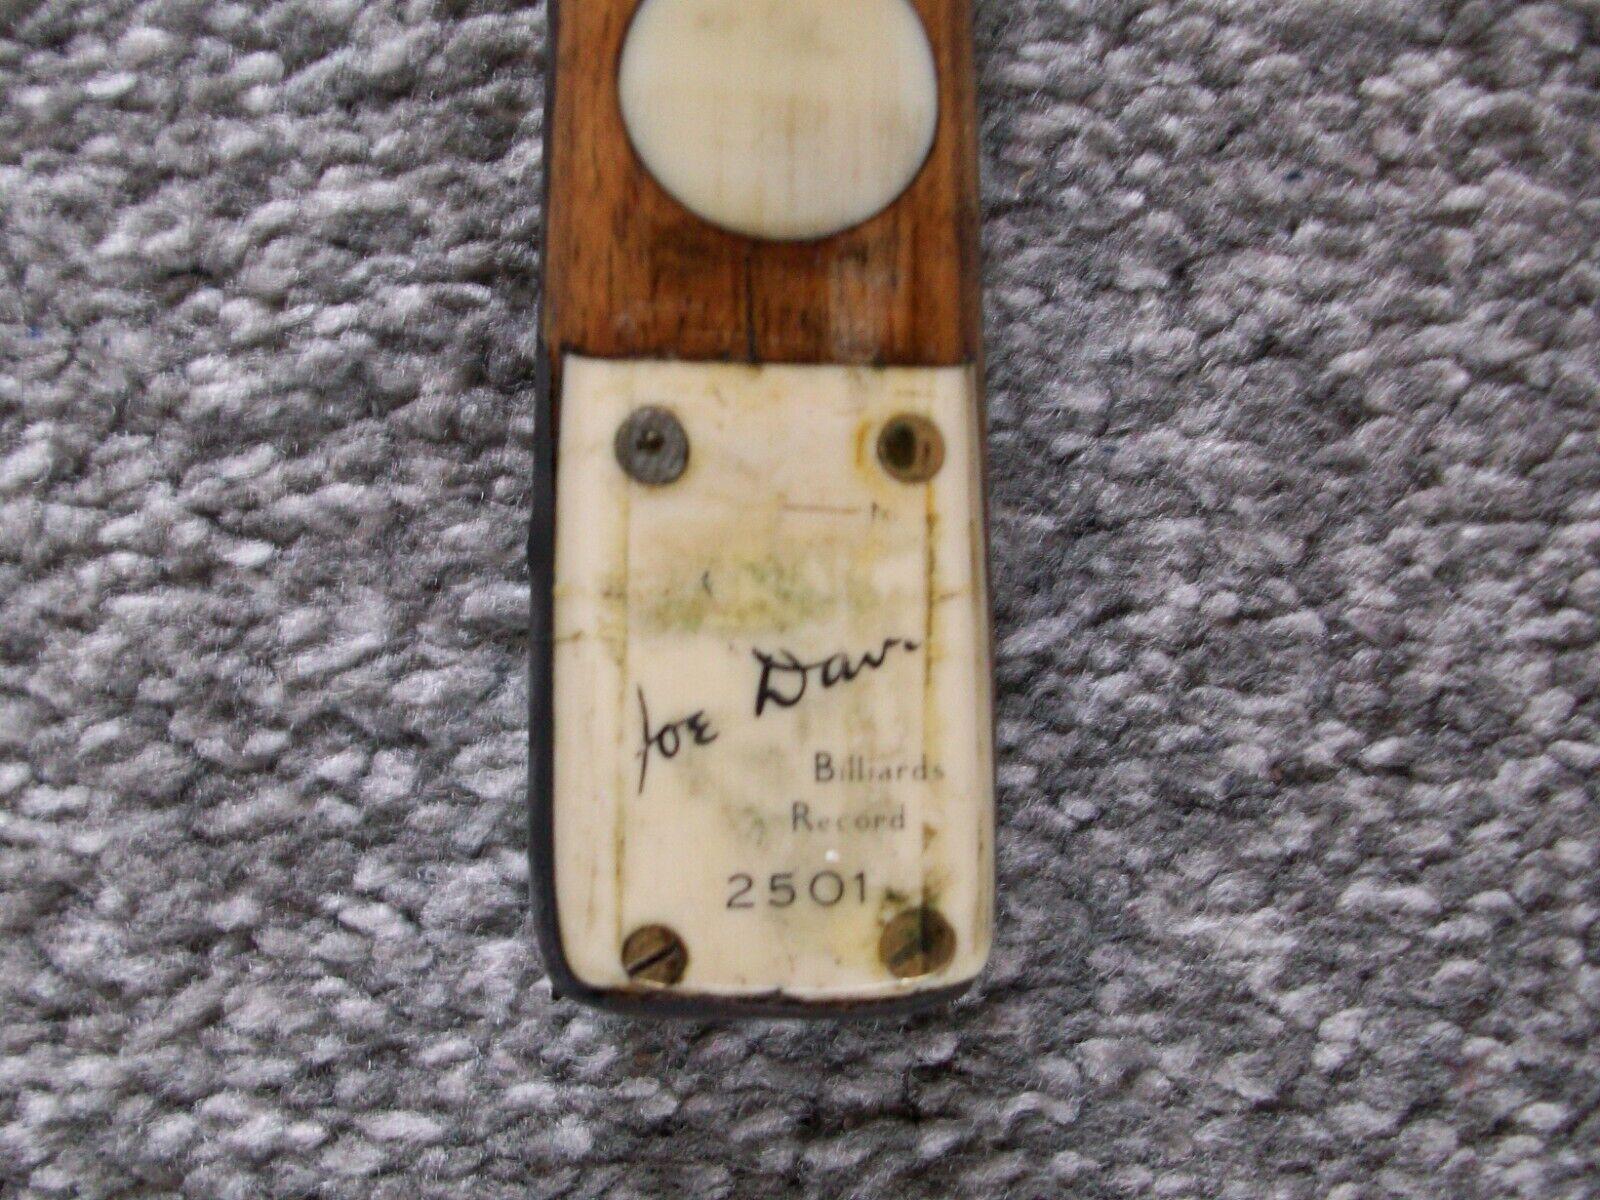 JOE DAVIS SNOOKER CUE (ONE PIECE) MEMORABILIA -- BILLIARDS RECORD 2501